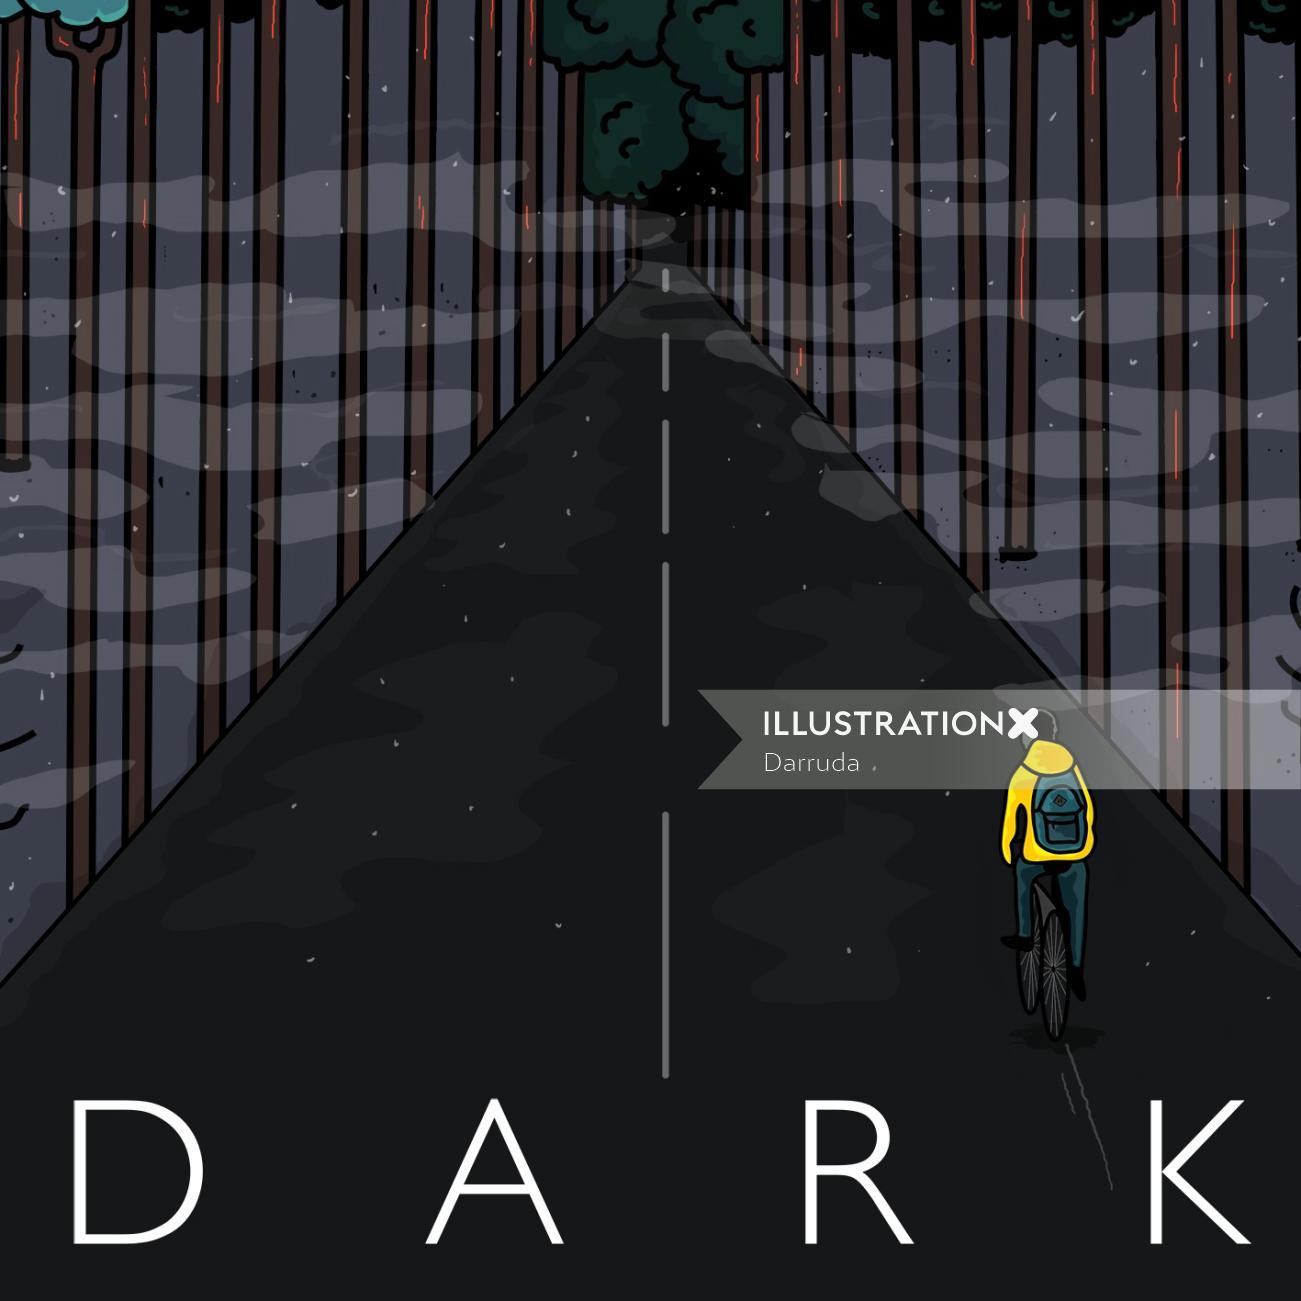 Digital dark path illustration